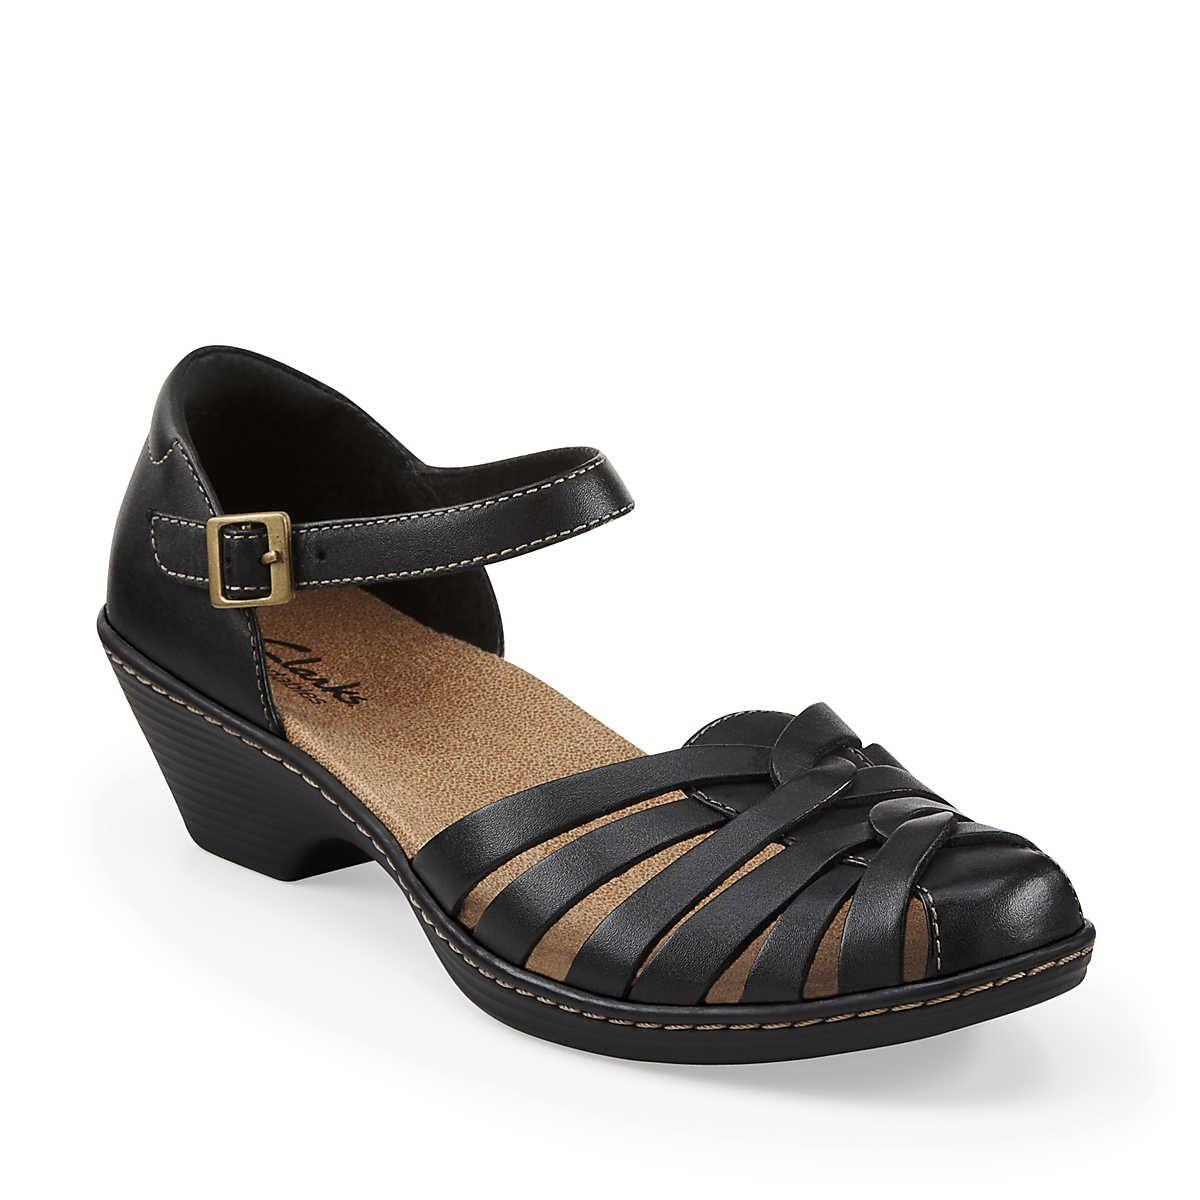 c128aa0c5f4 Clark sandals discontinued